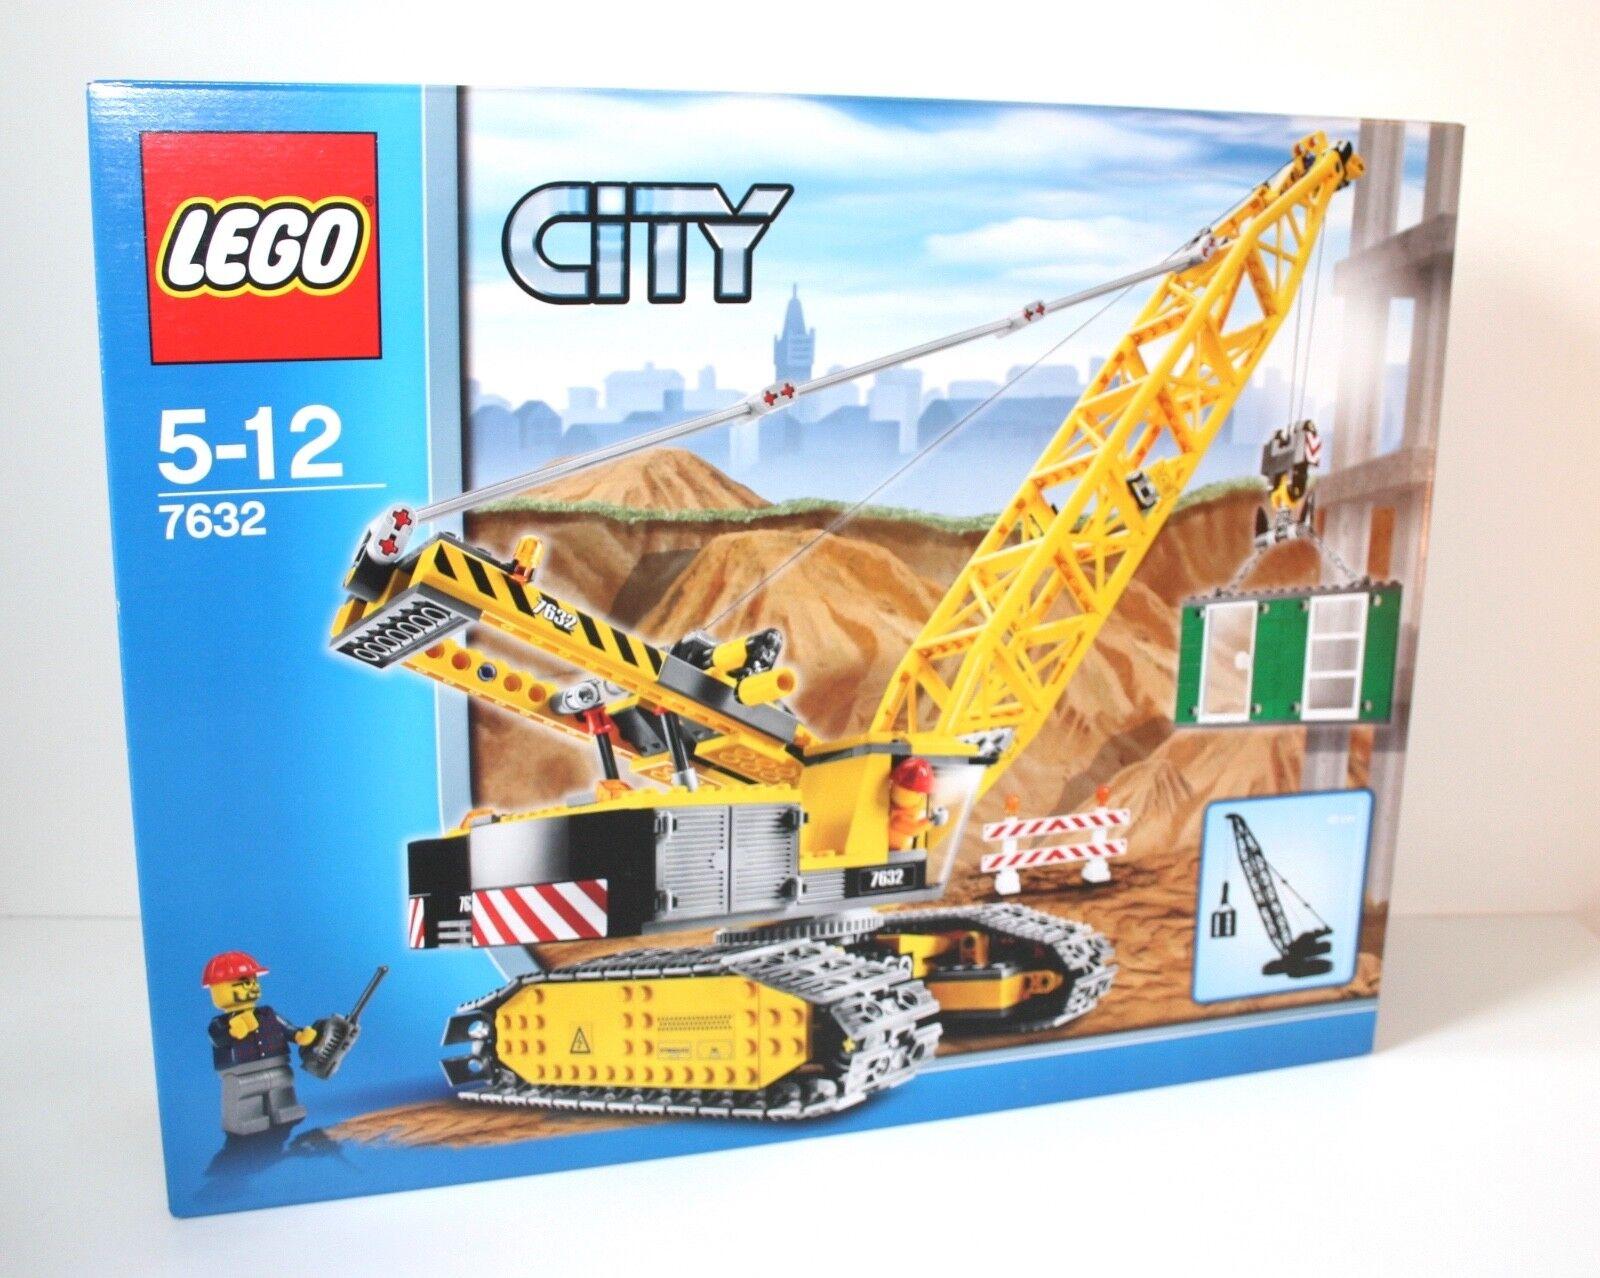 Lego ® City 7632 gran orugas-grúa Crawler Crace obra OVP misb 2009